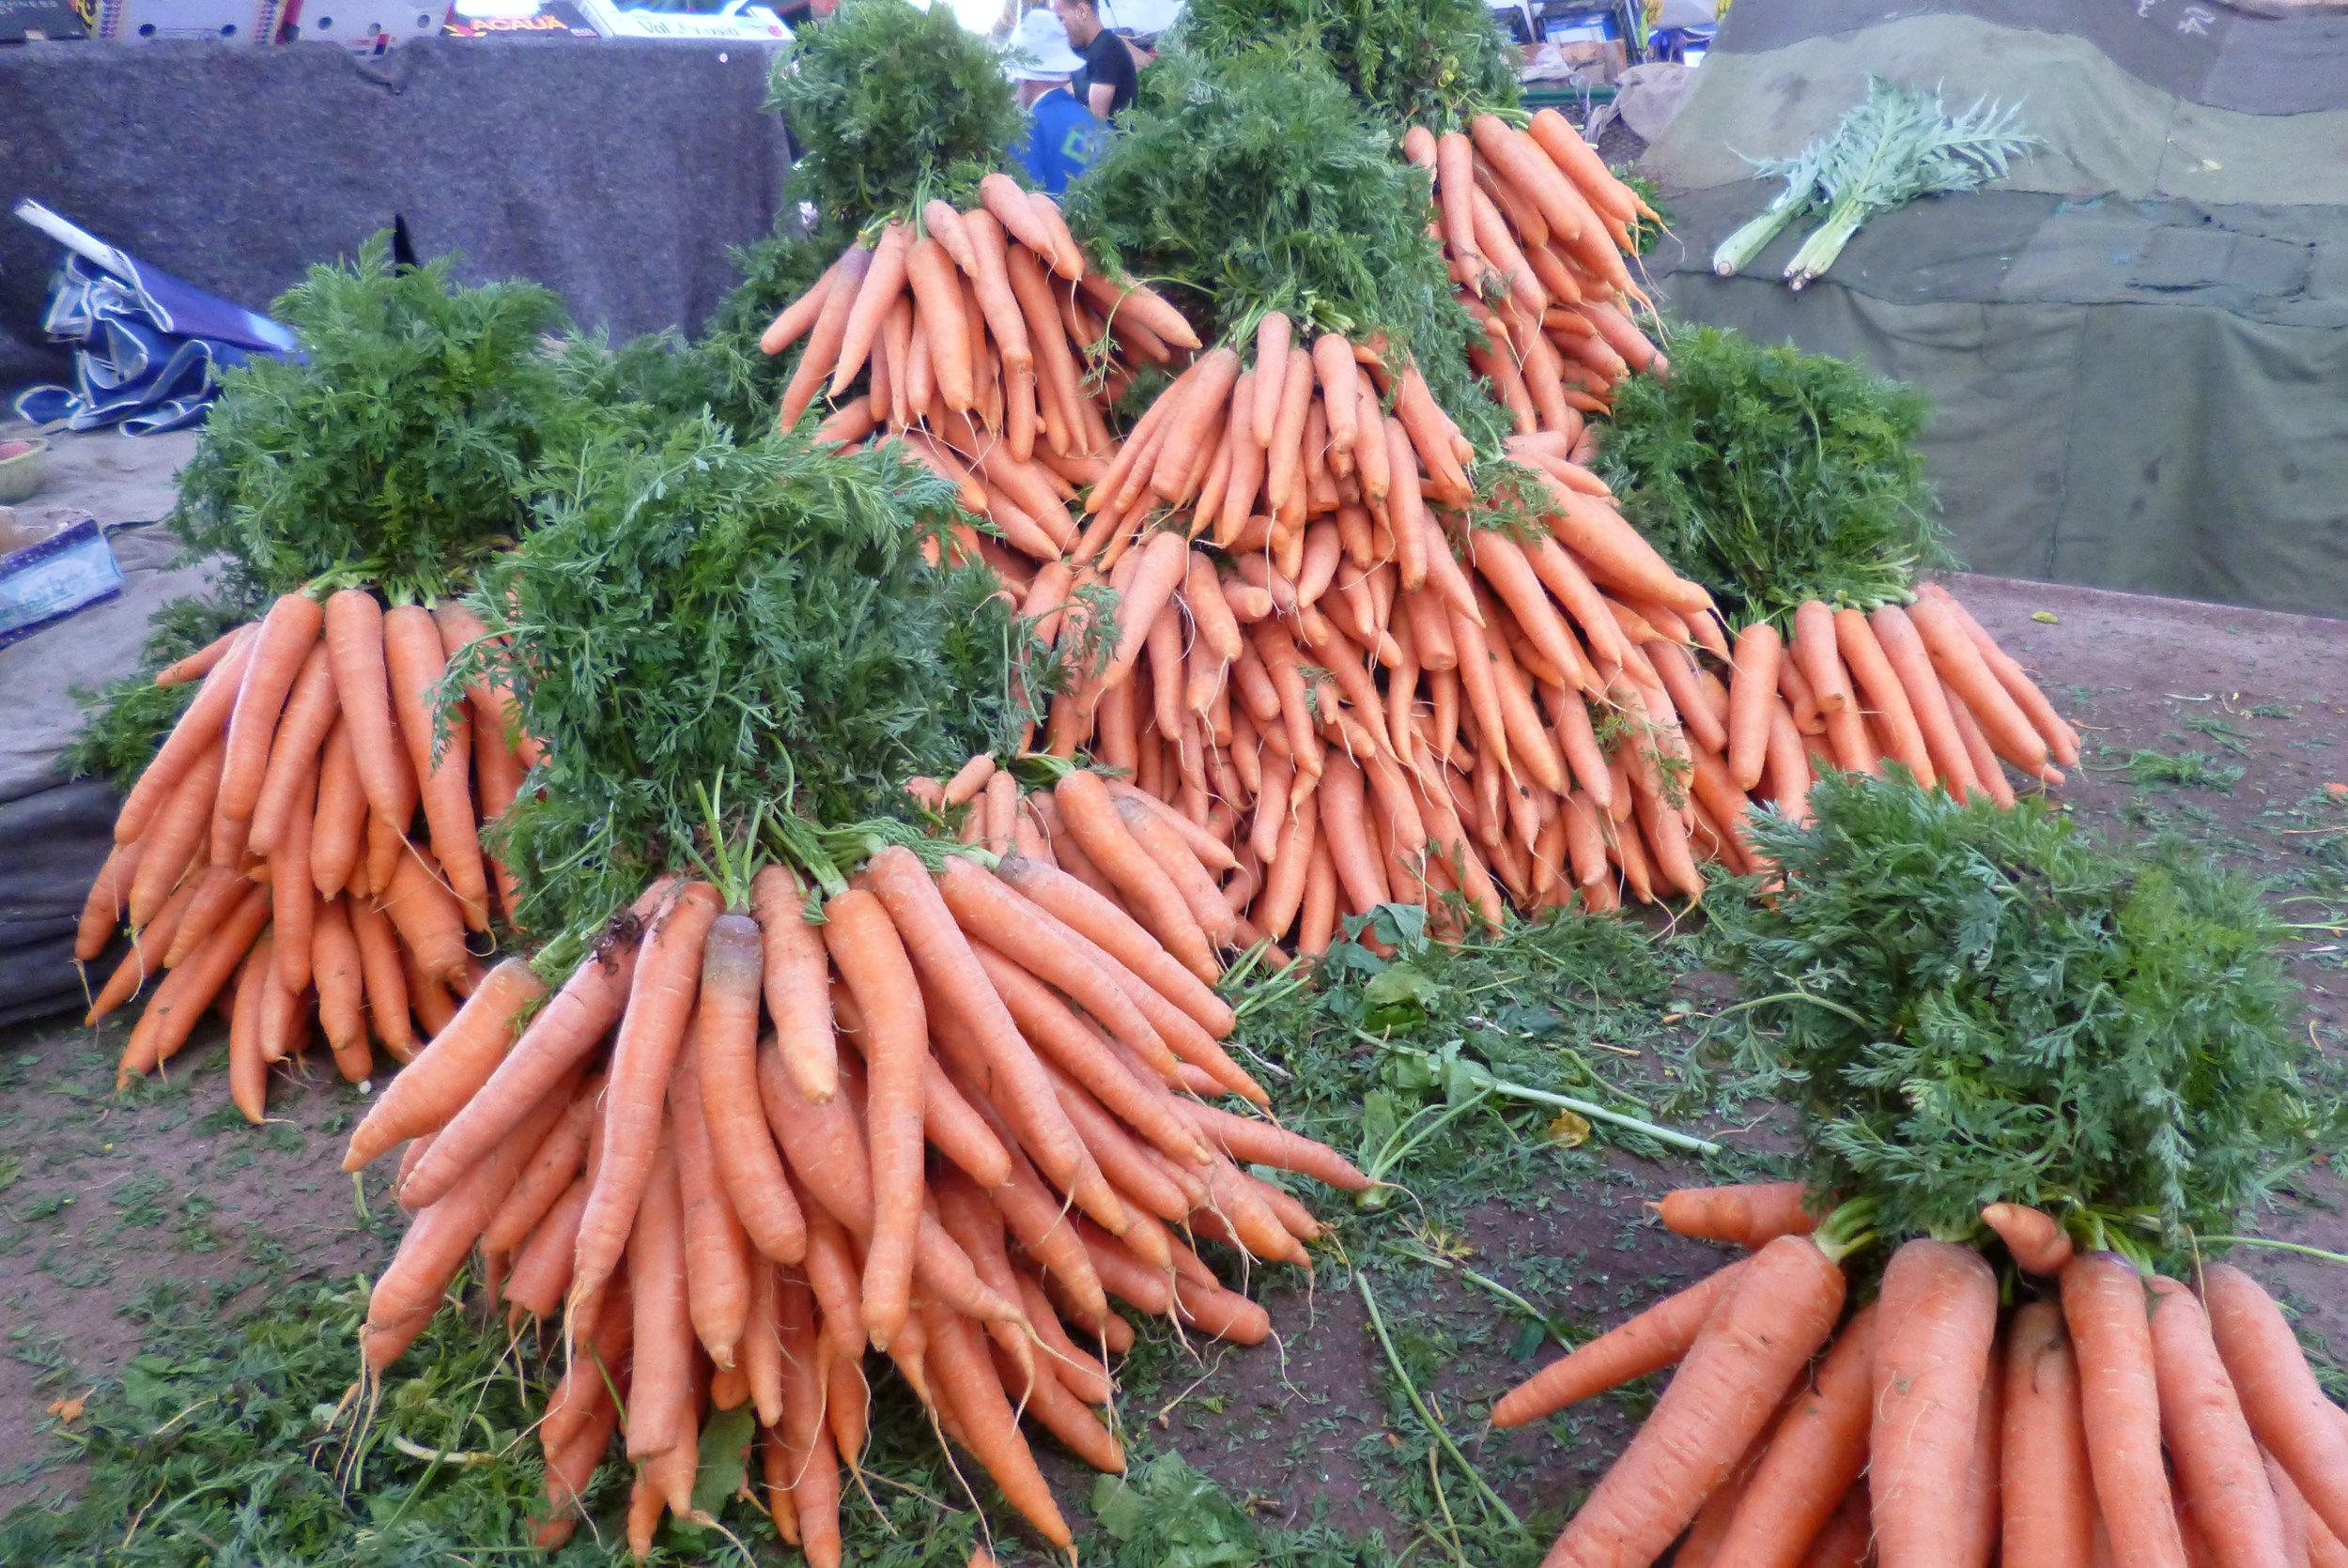 Canva - Bazaar, Market, Carrots, Vegetables, Carrot, Food.jpg